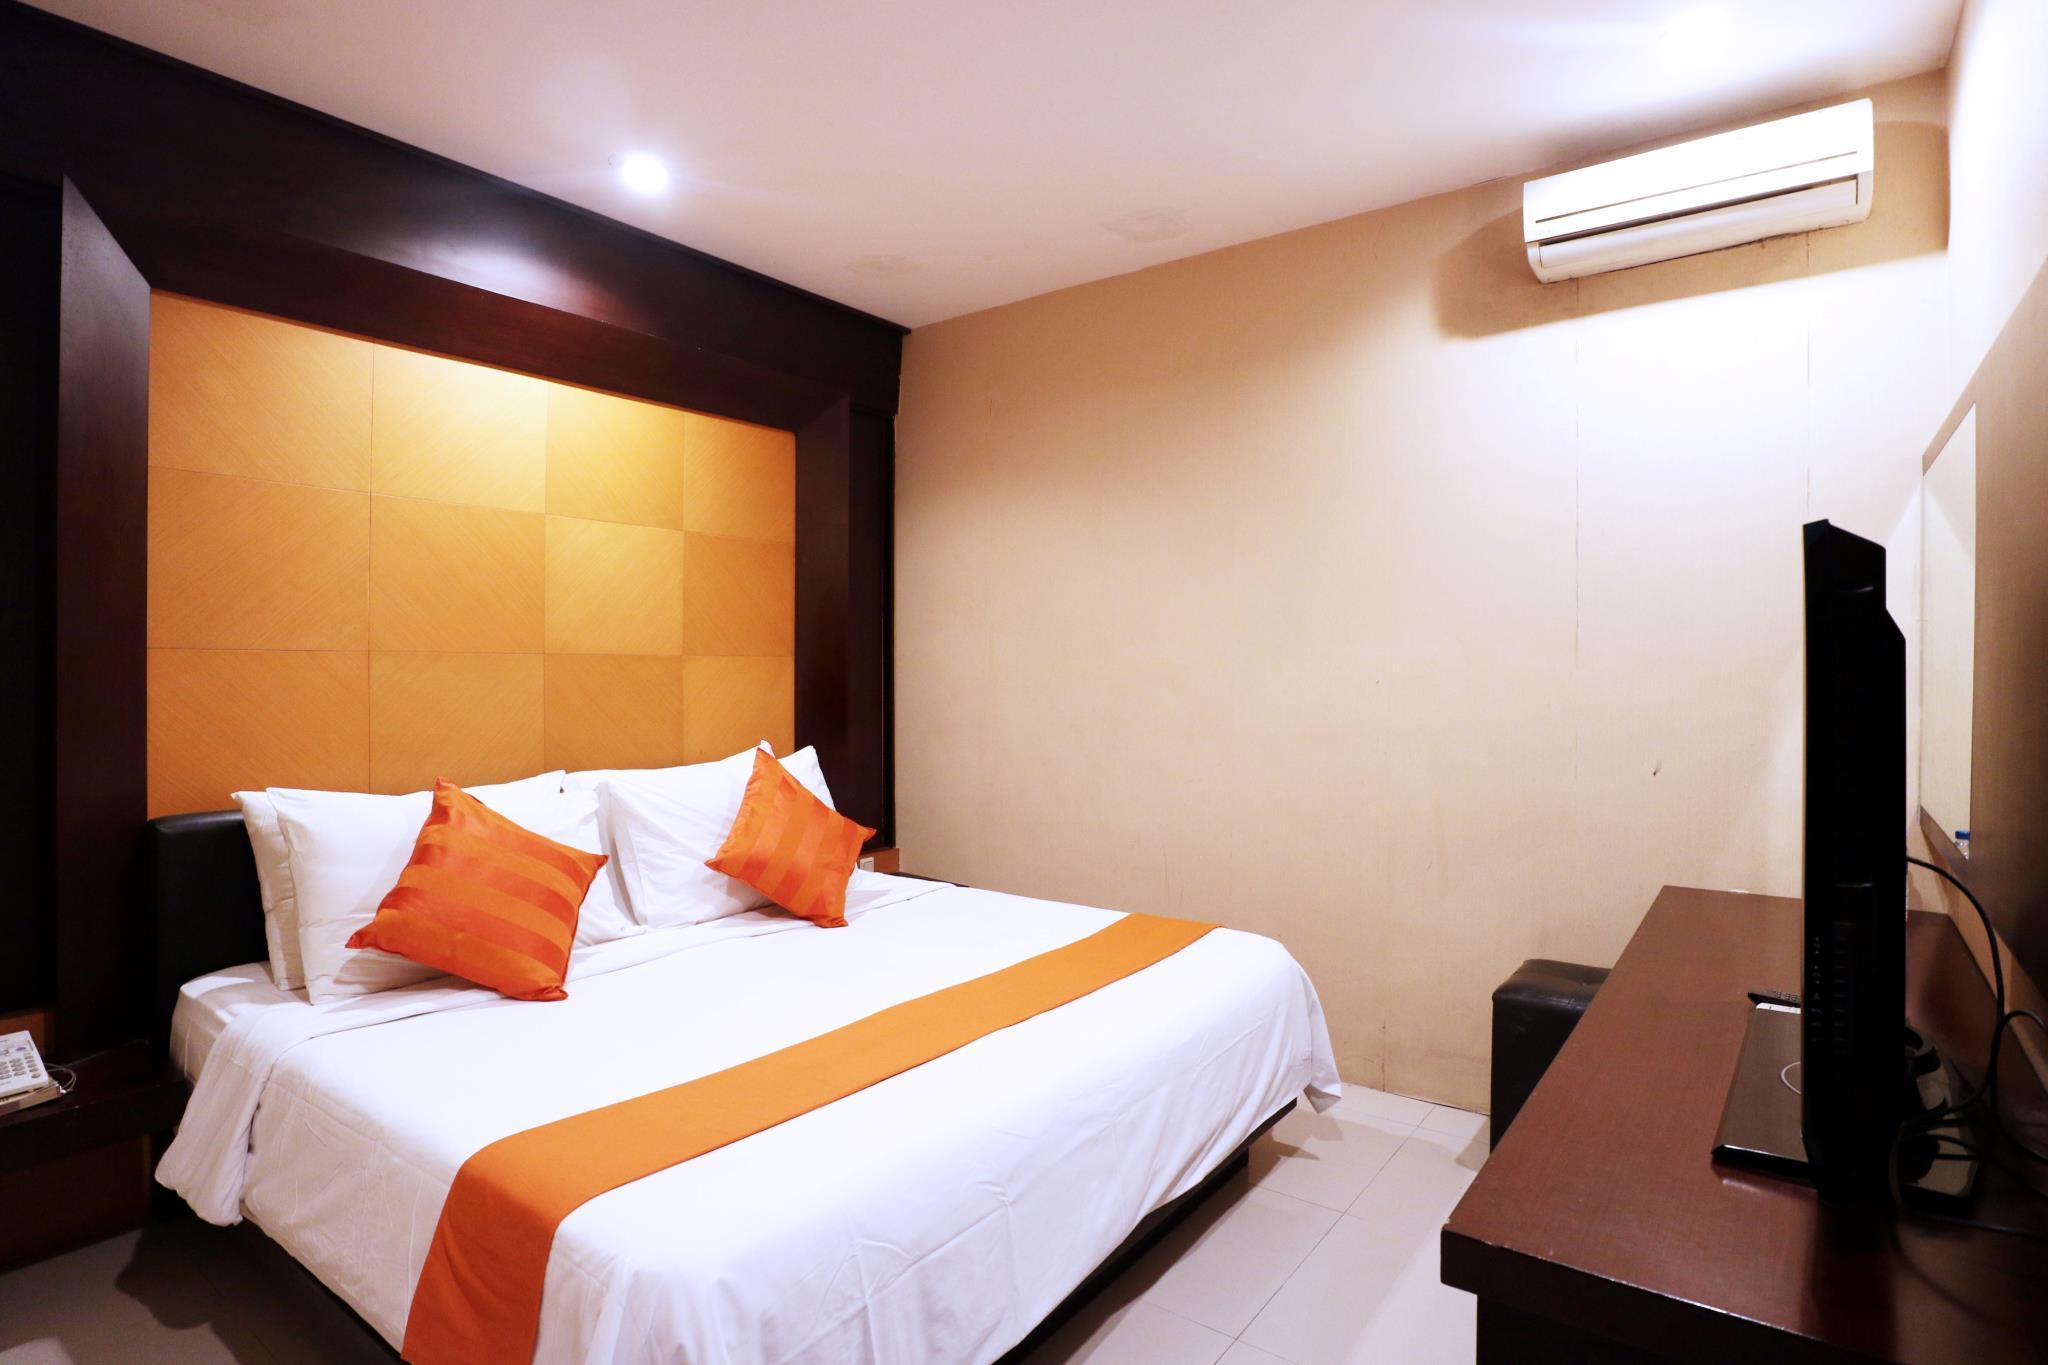 Hotel Istana Permata Ngagel Flyers For Permata Ngagel Flyers Wwwgooflyerscom